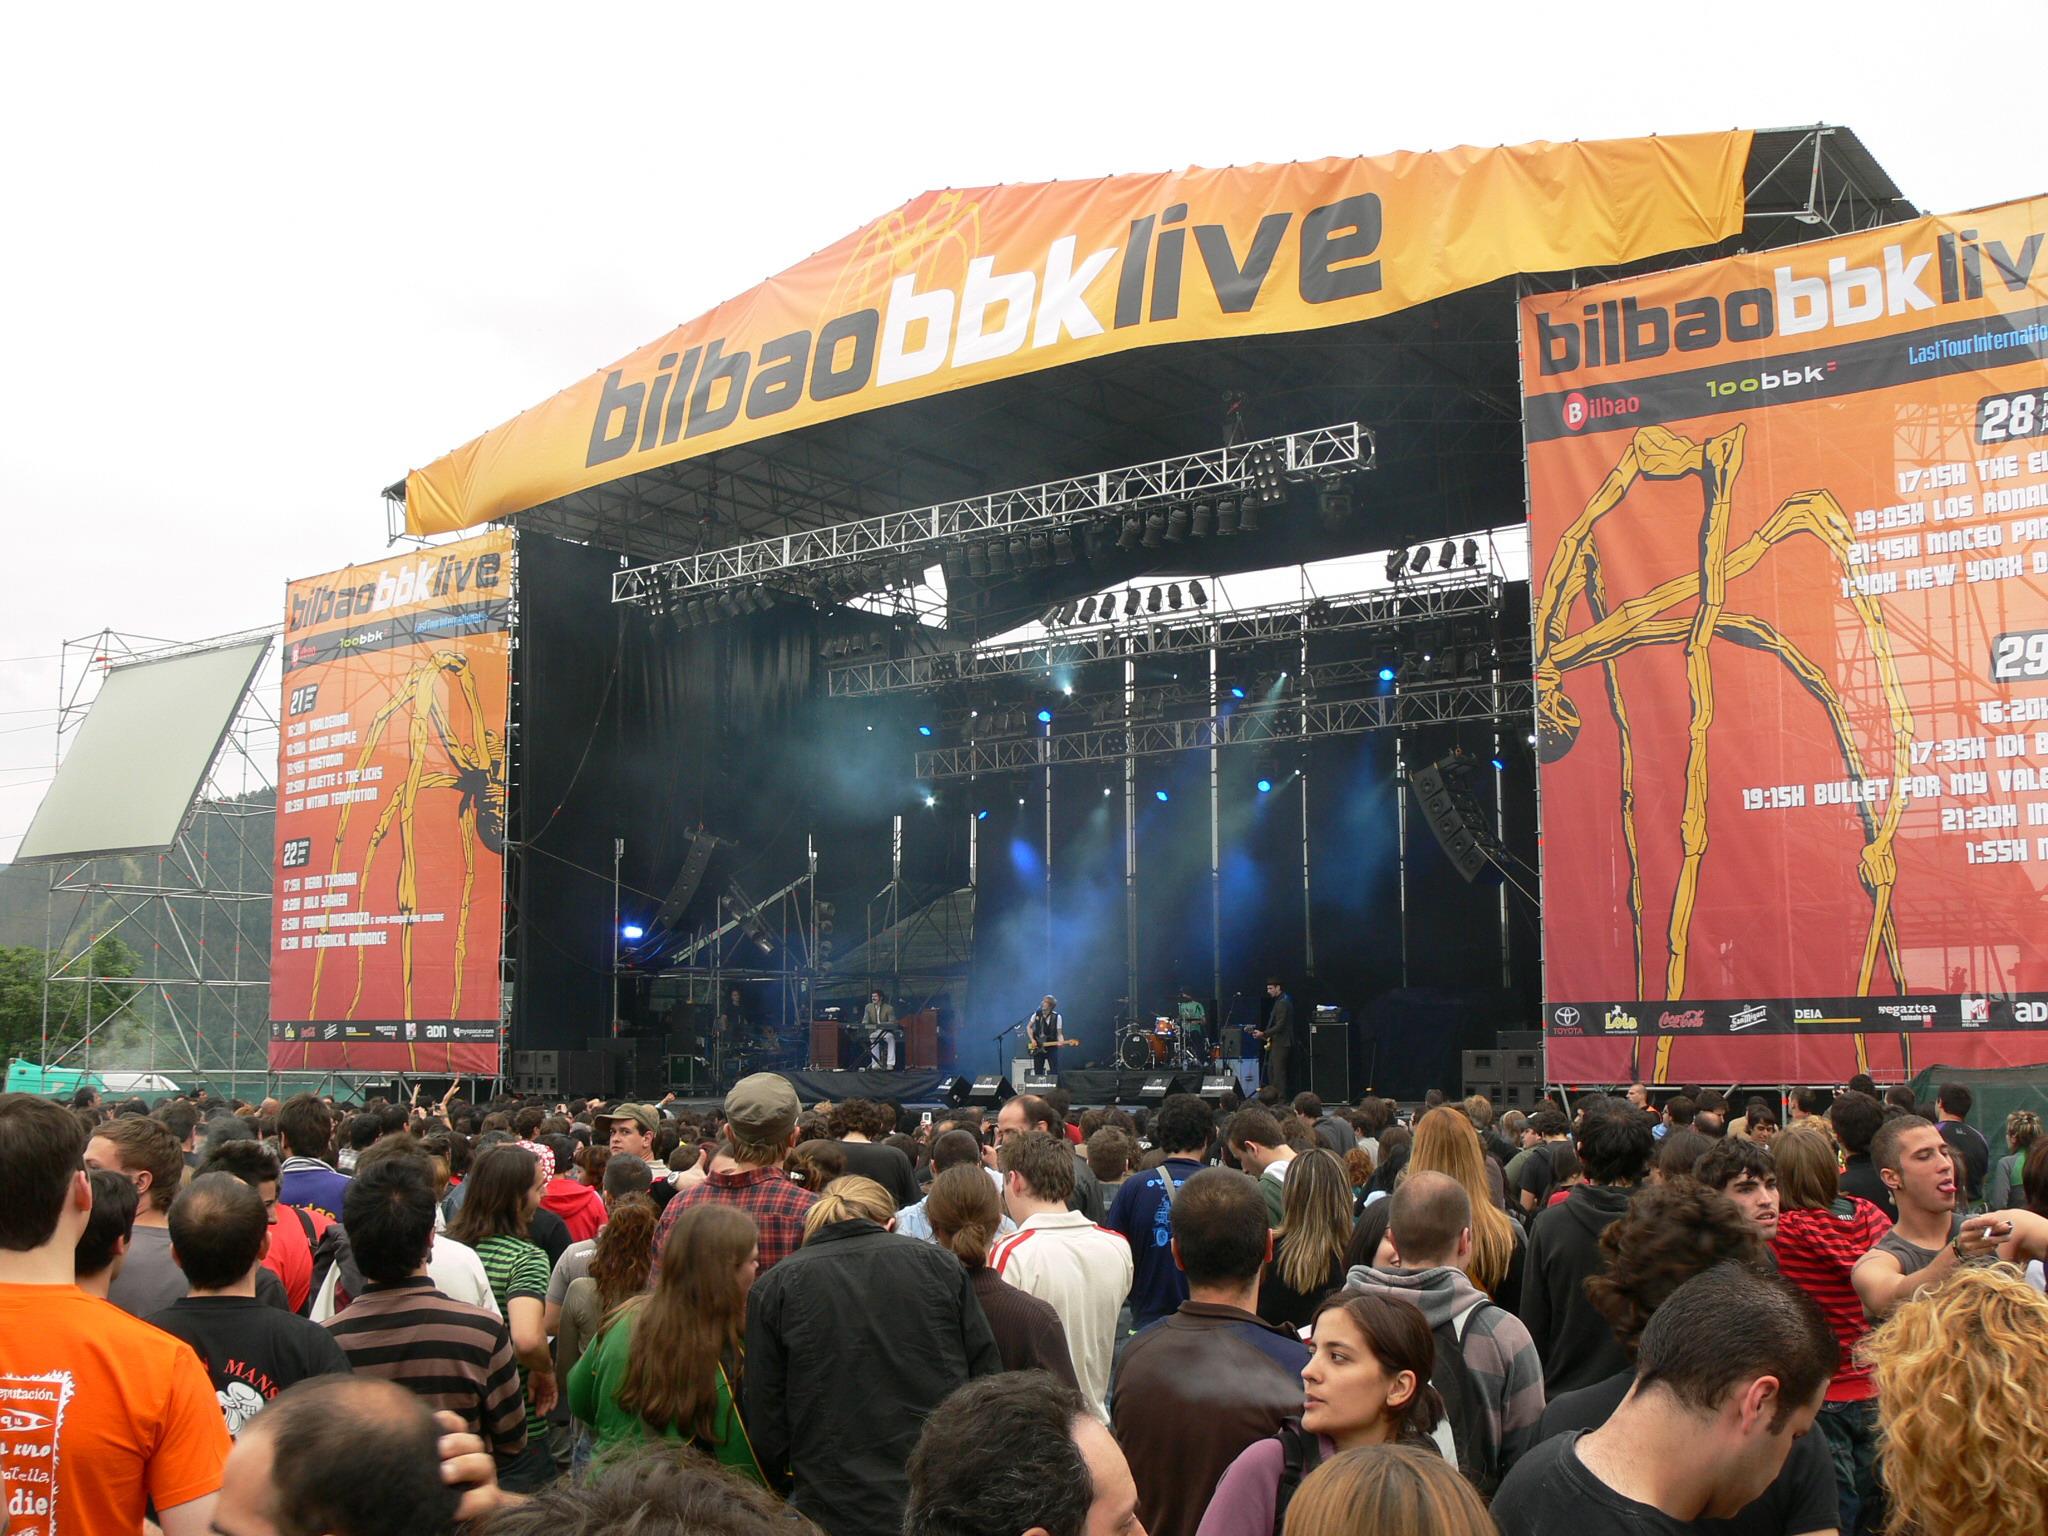 Escenario del festival de música Bilbao BBK Live